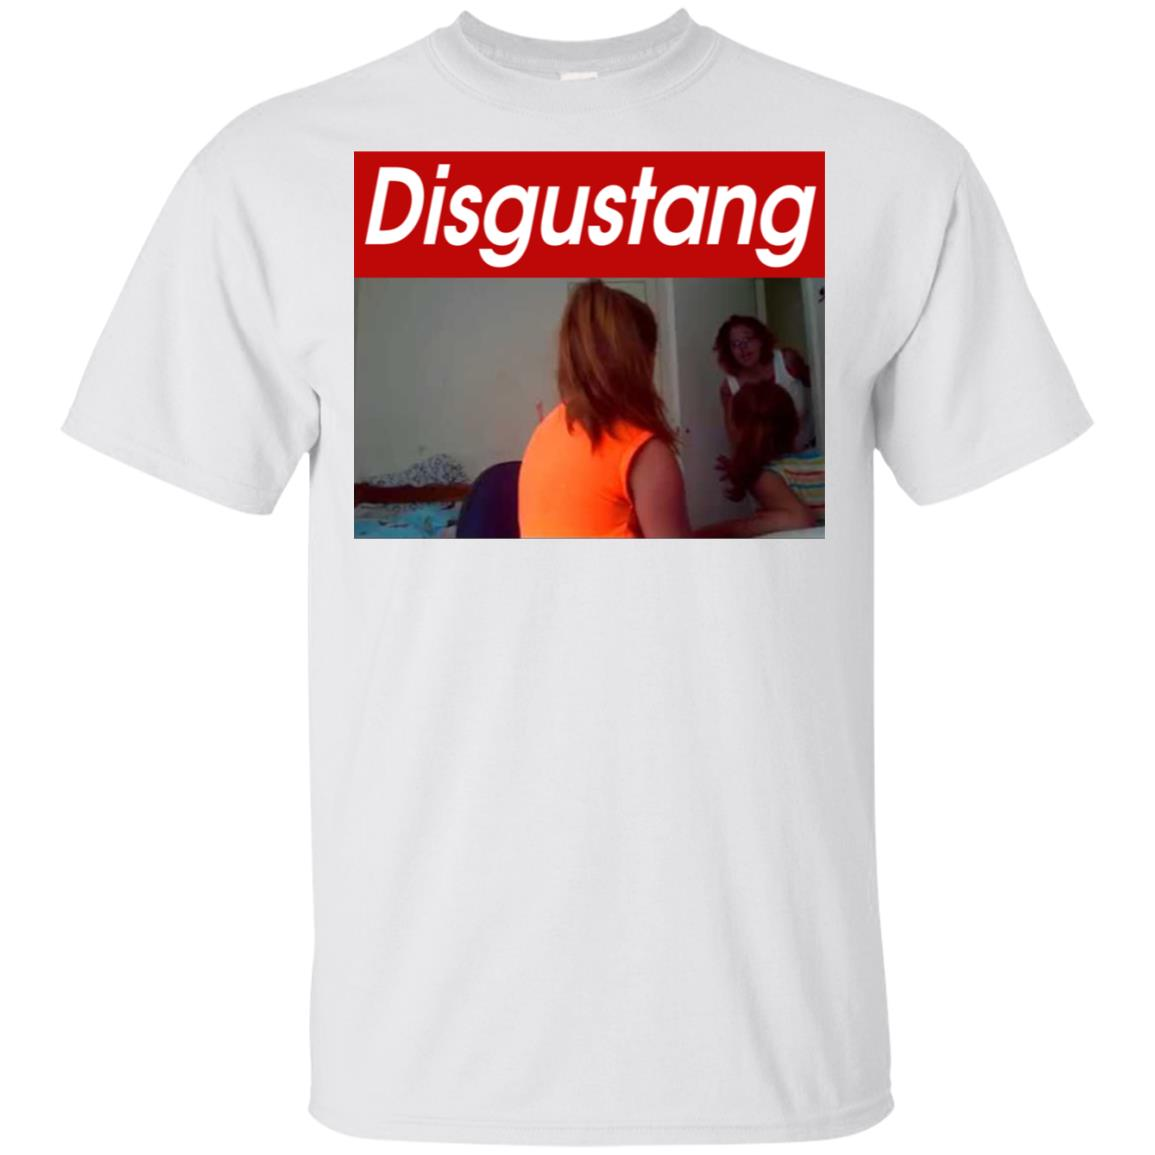 cheap for discount 3ea3b 4200f Disgustang Shirt